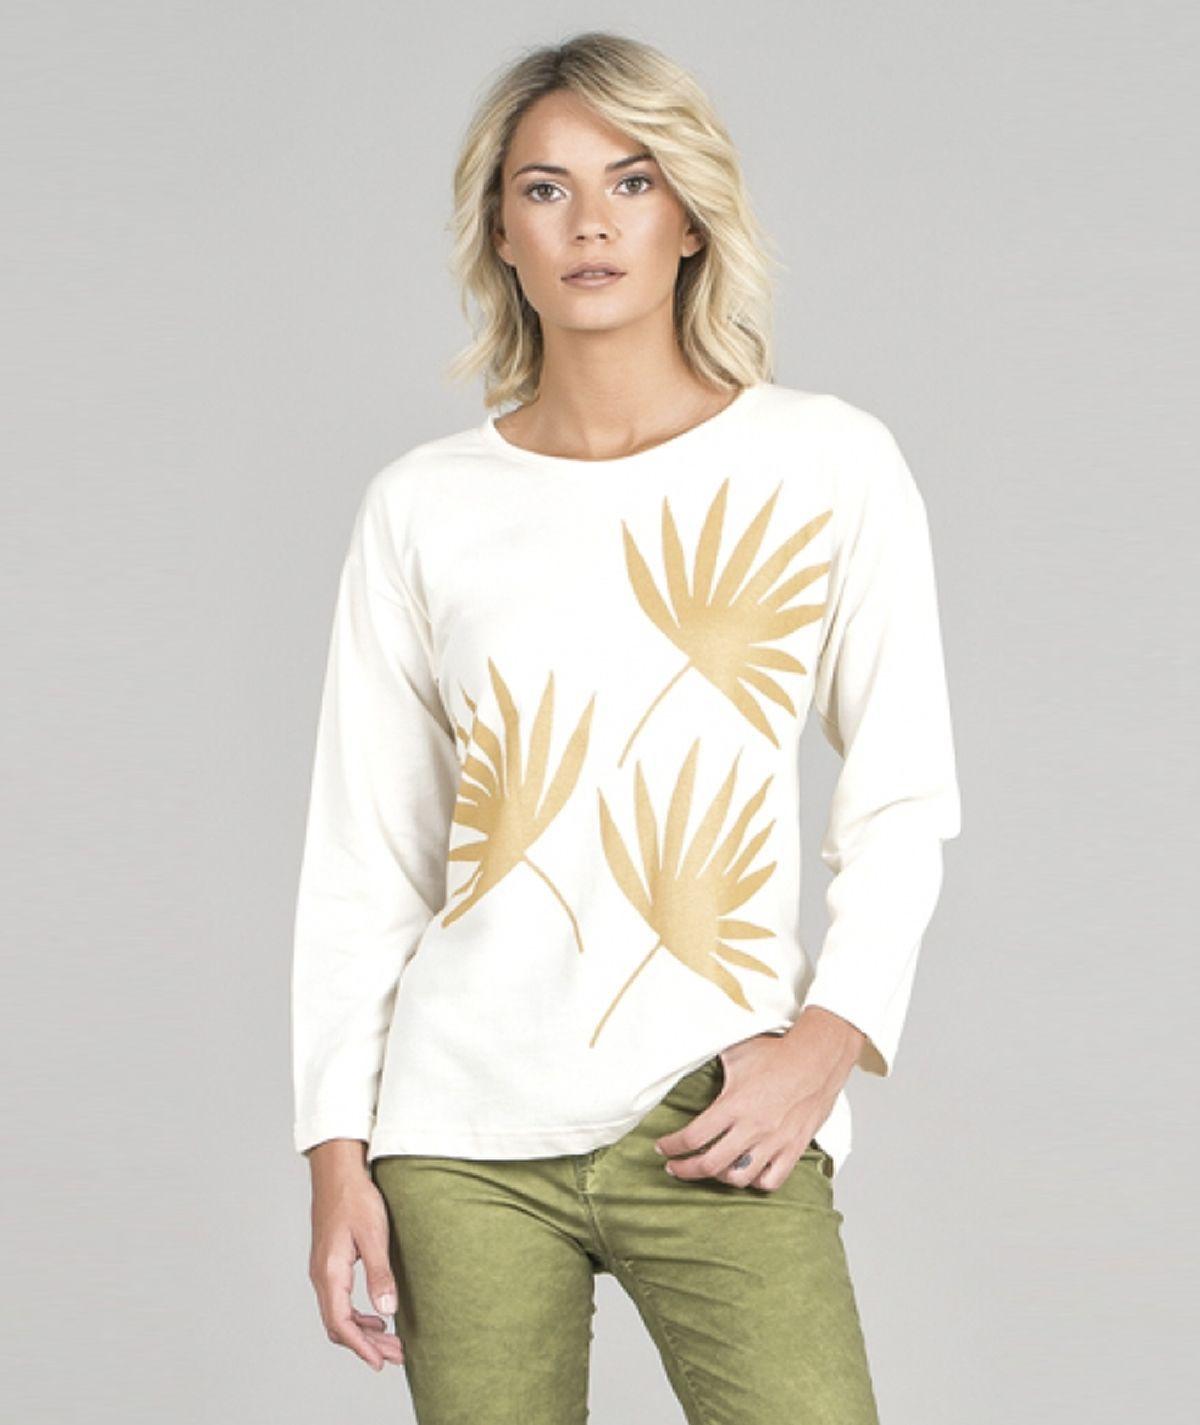 Sweater motivo folhas